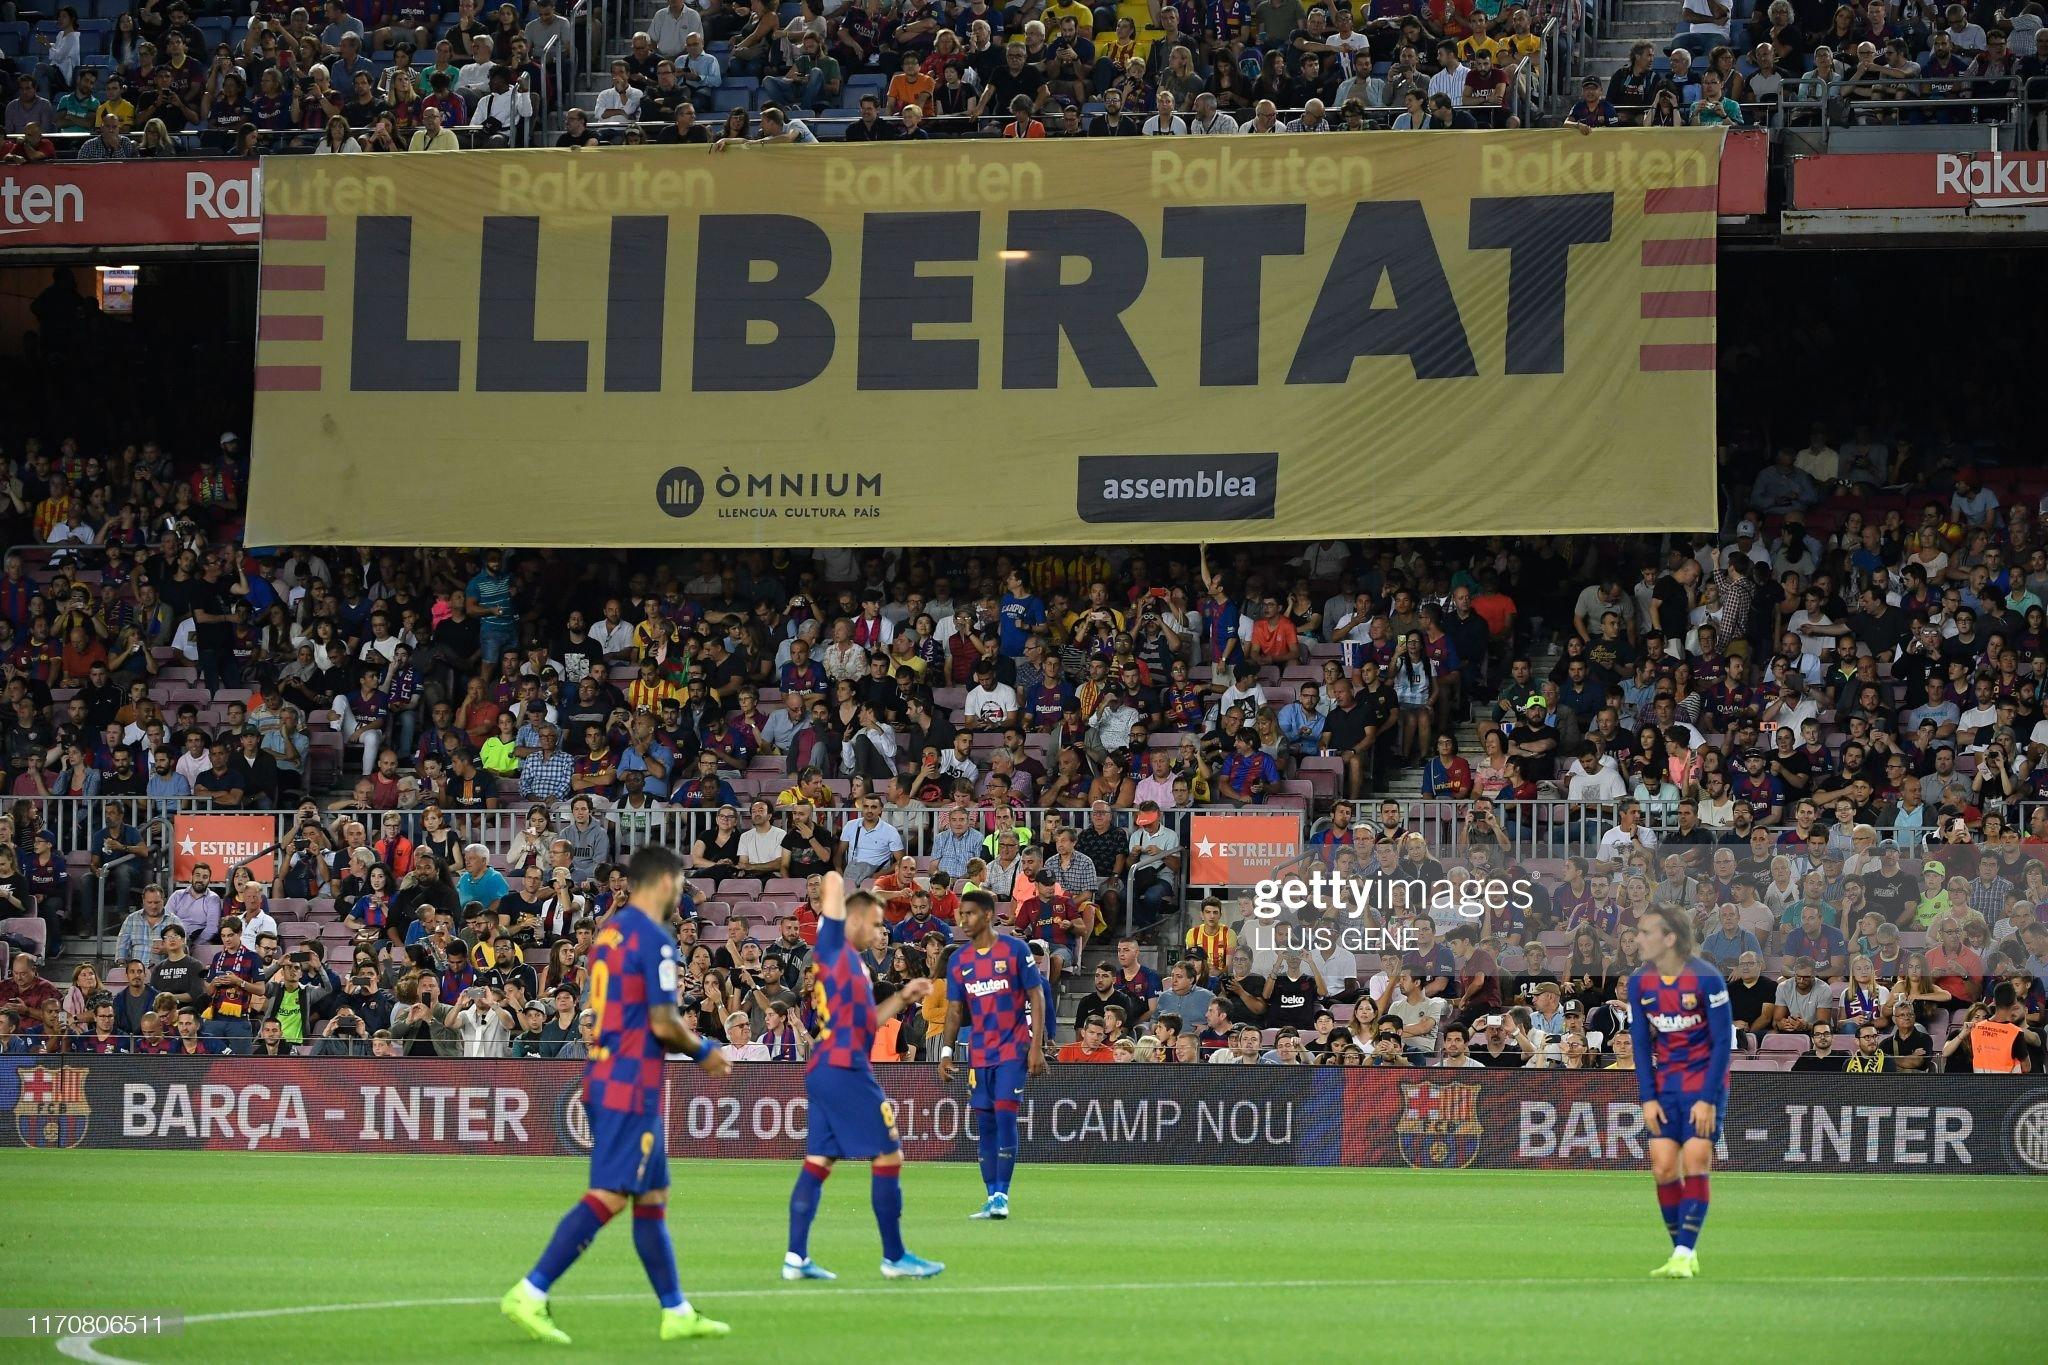 صور مباراة : برشلونة - فياريال 2-1 ( 24-09-2019 )  Banner-with-the-word-llibertat-is-displayed-on-the-stands-during-the-picture-id1170806511?s=2048x2048